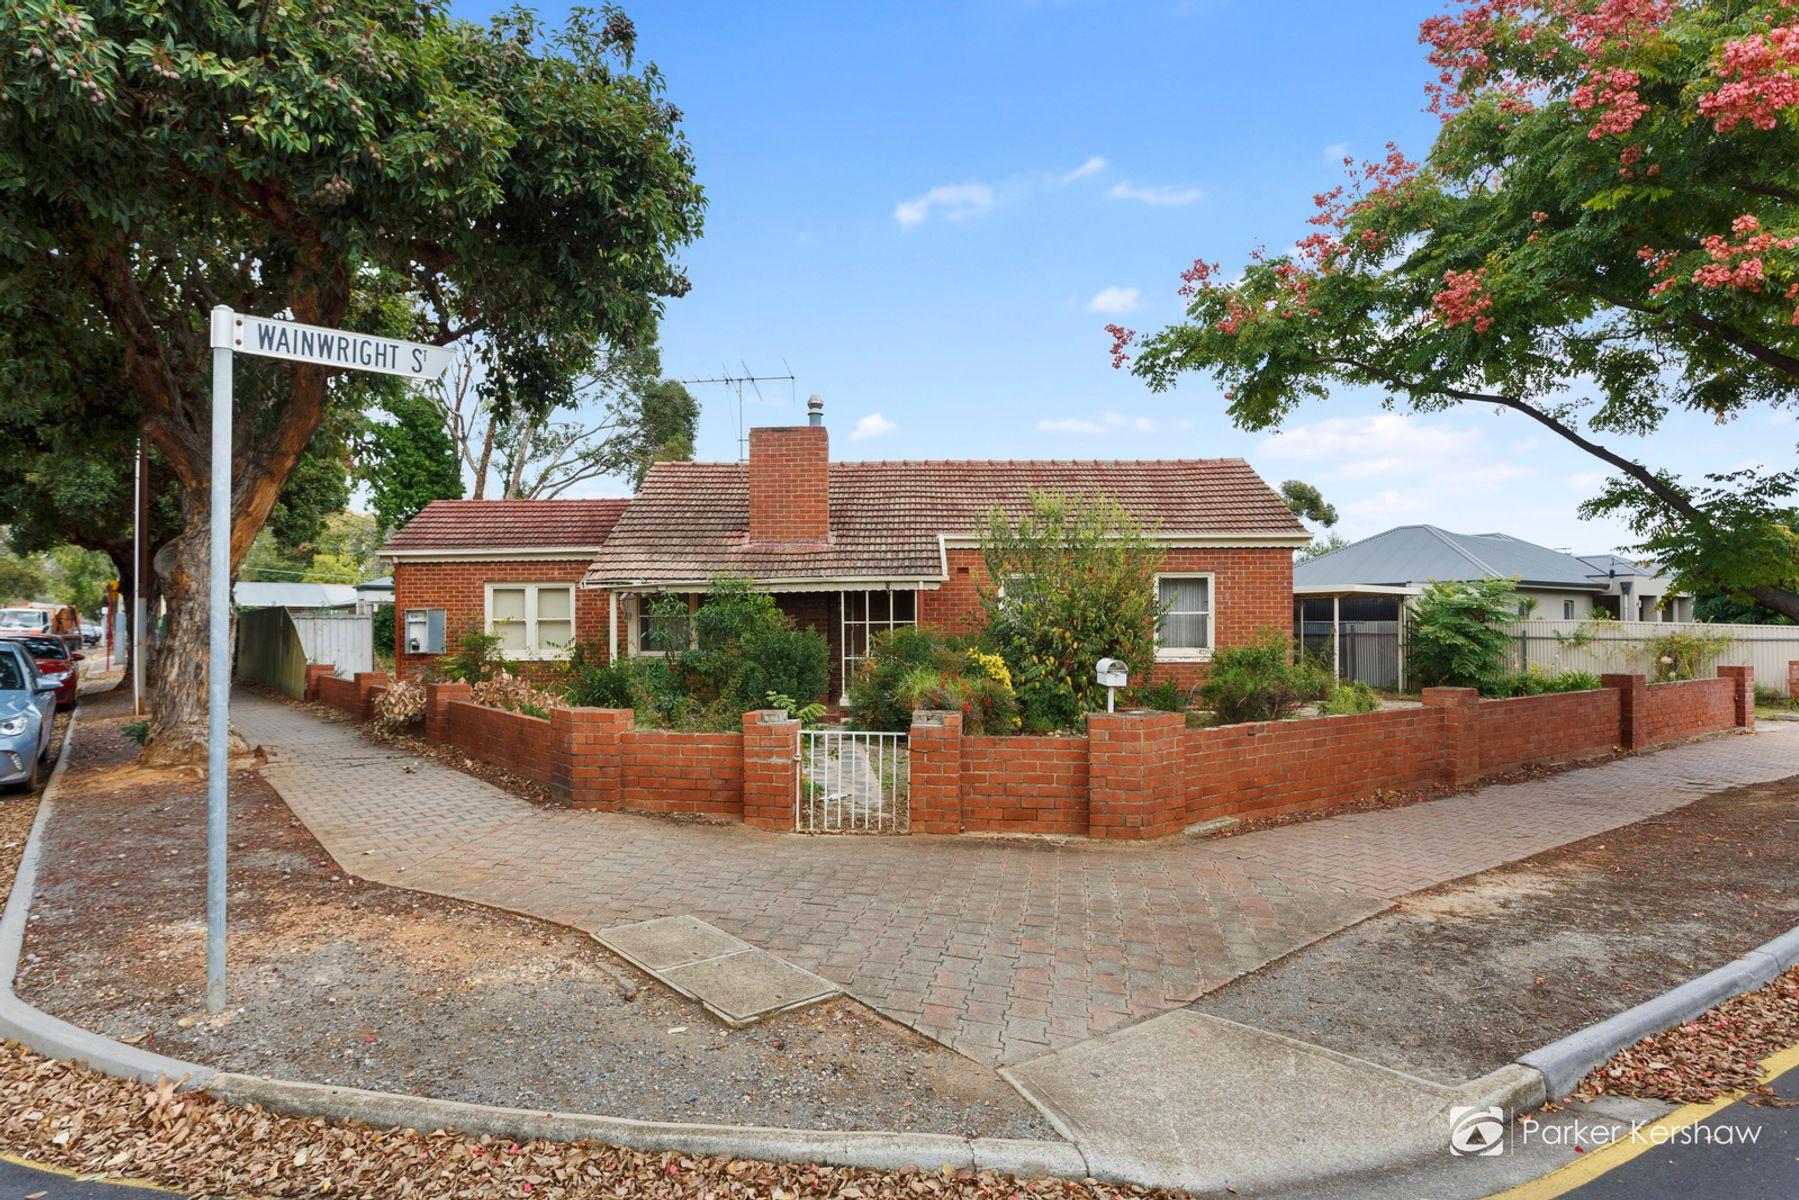 1 Wainwright Street, Clarence Gardens, SA 5039